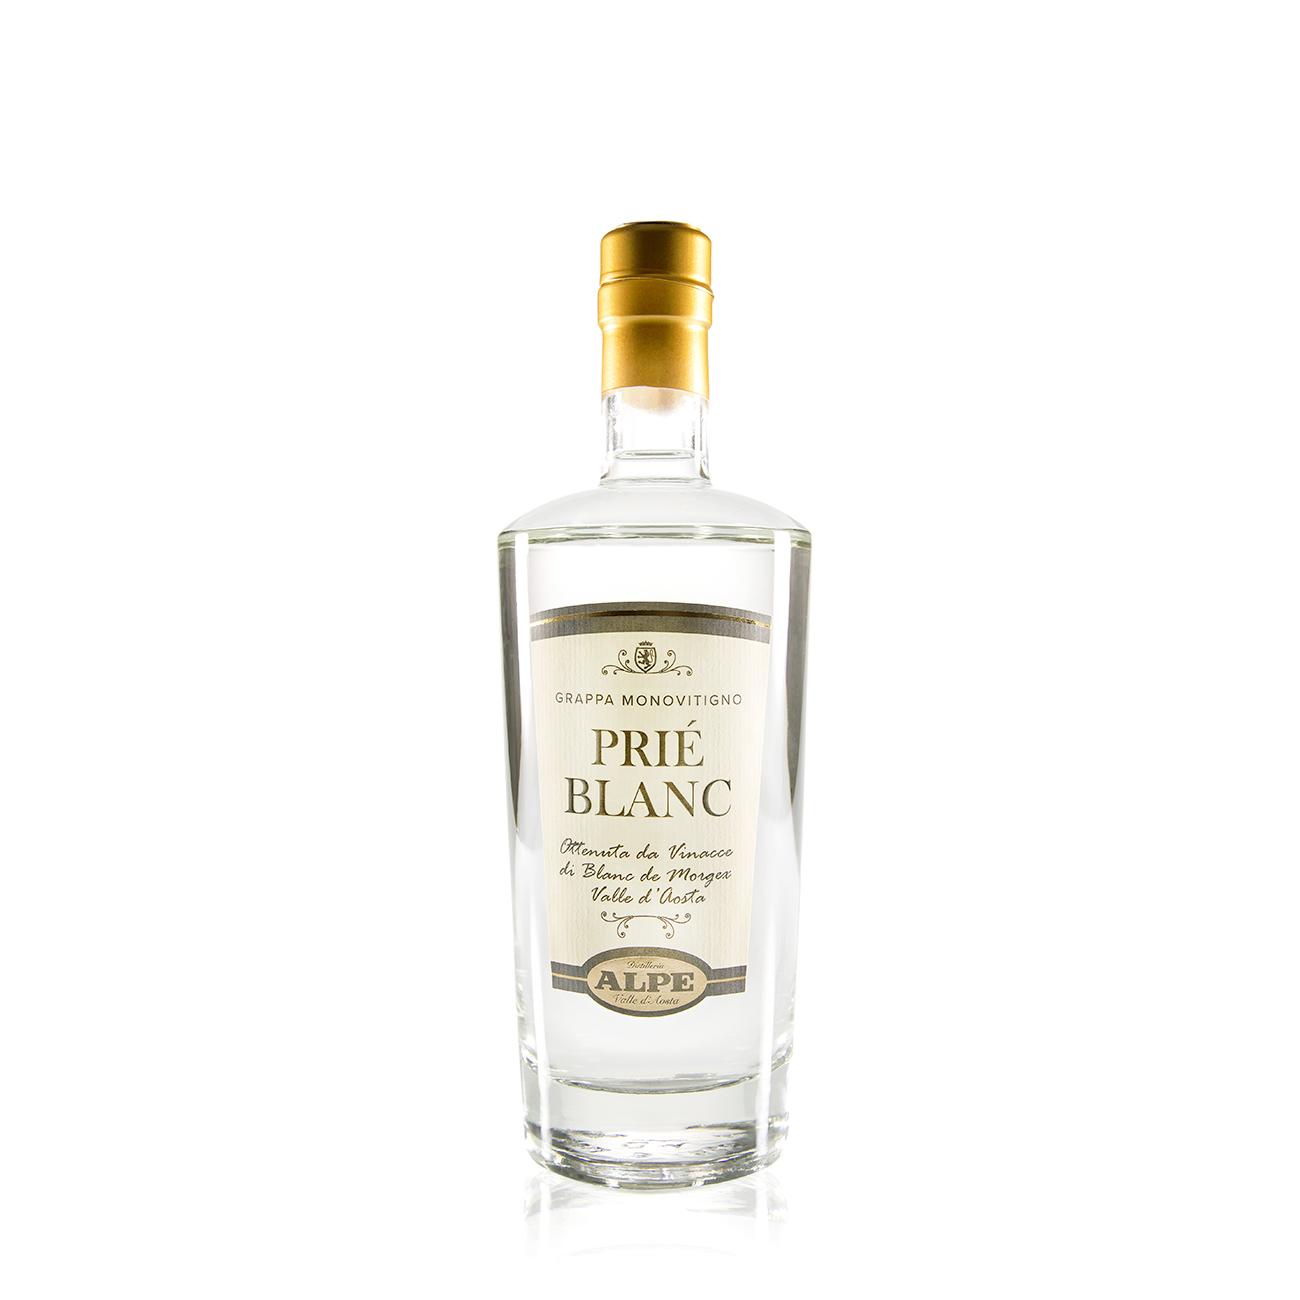 Grappa Monovitigno Prié Blanc